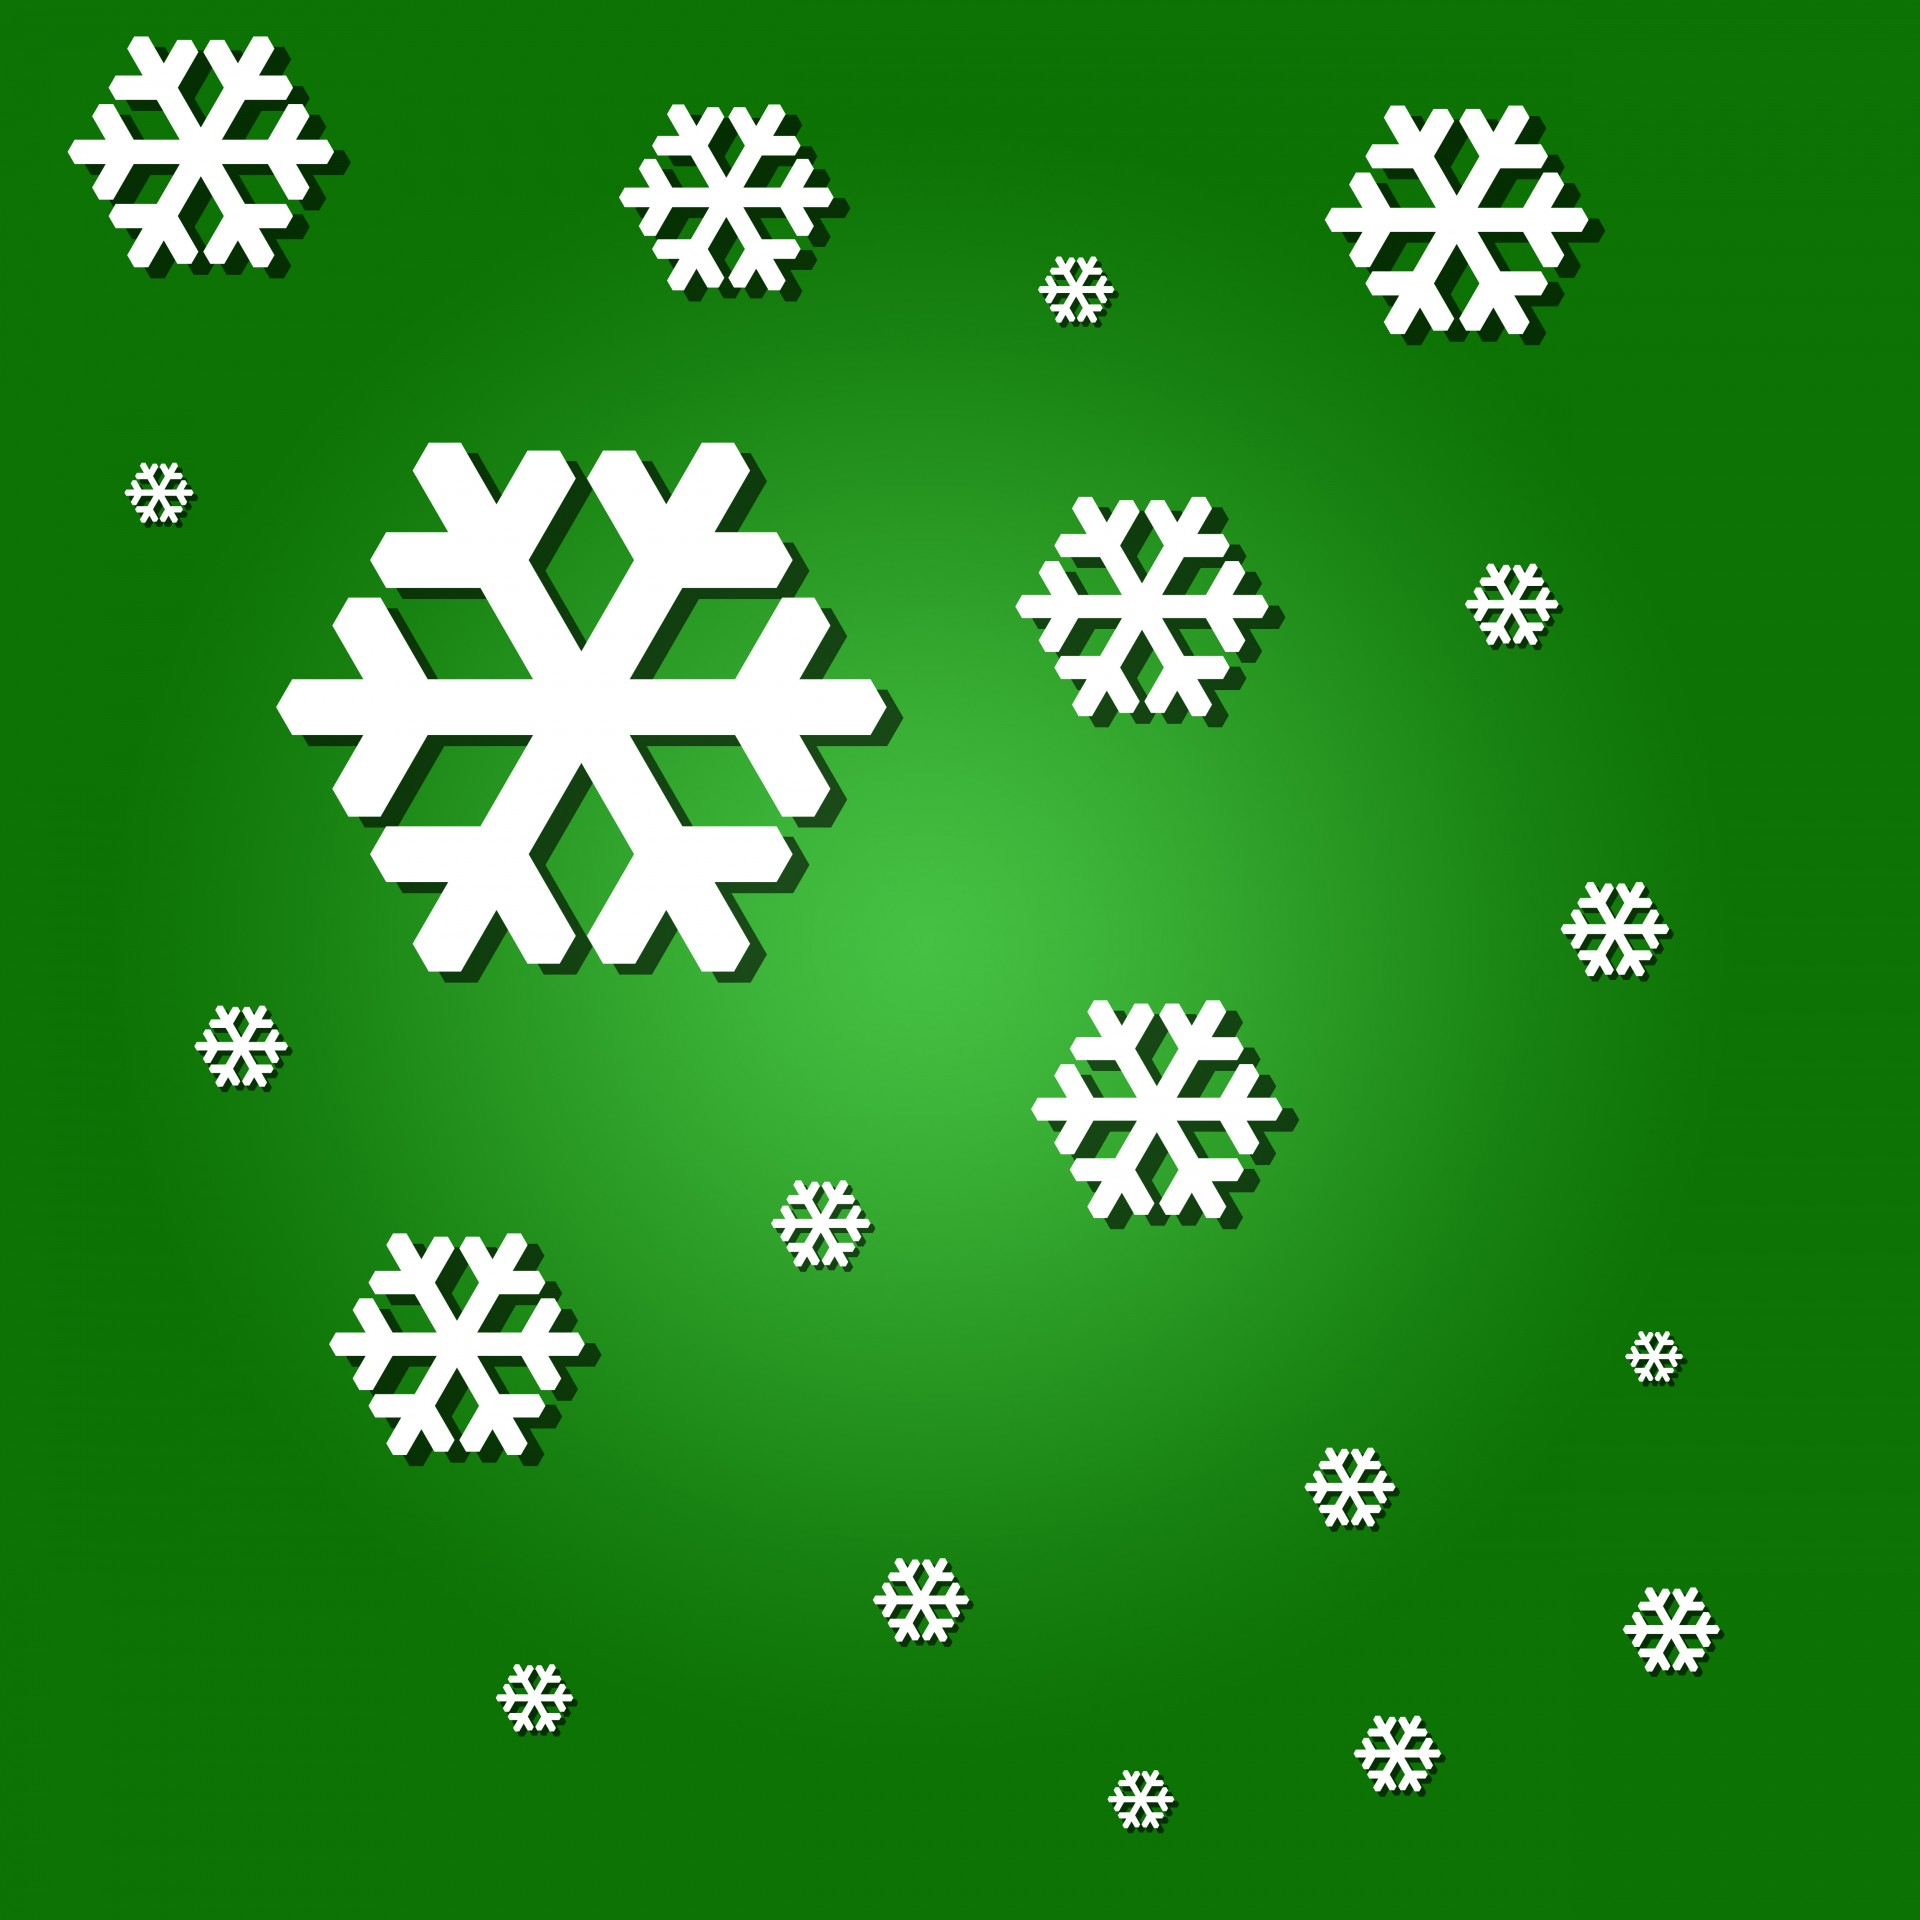 Snowflakes On Green Background Free Stock Photo Public